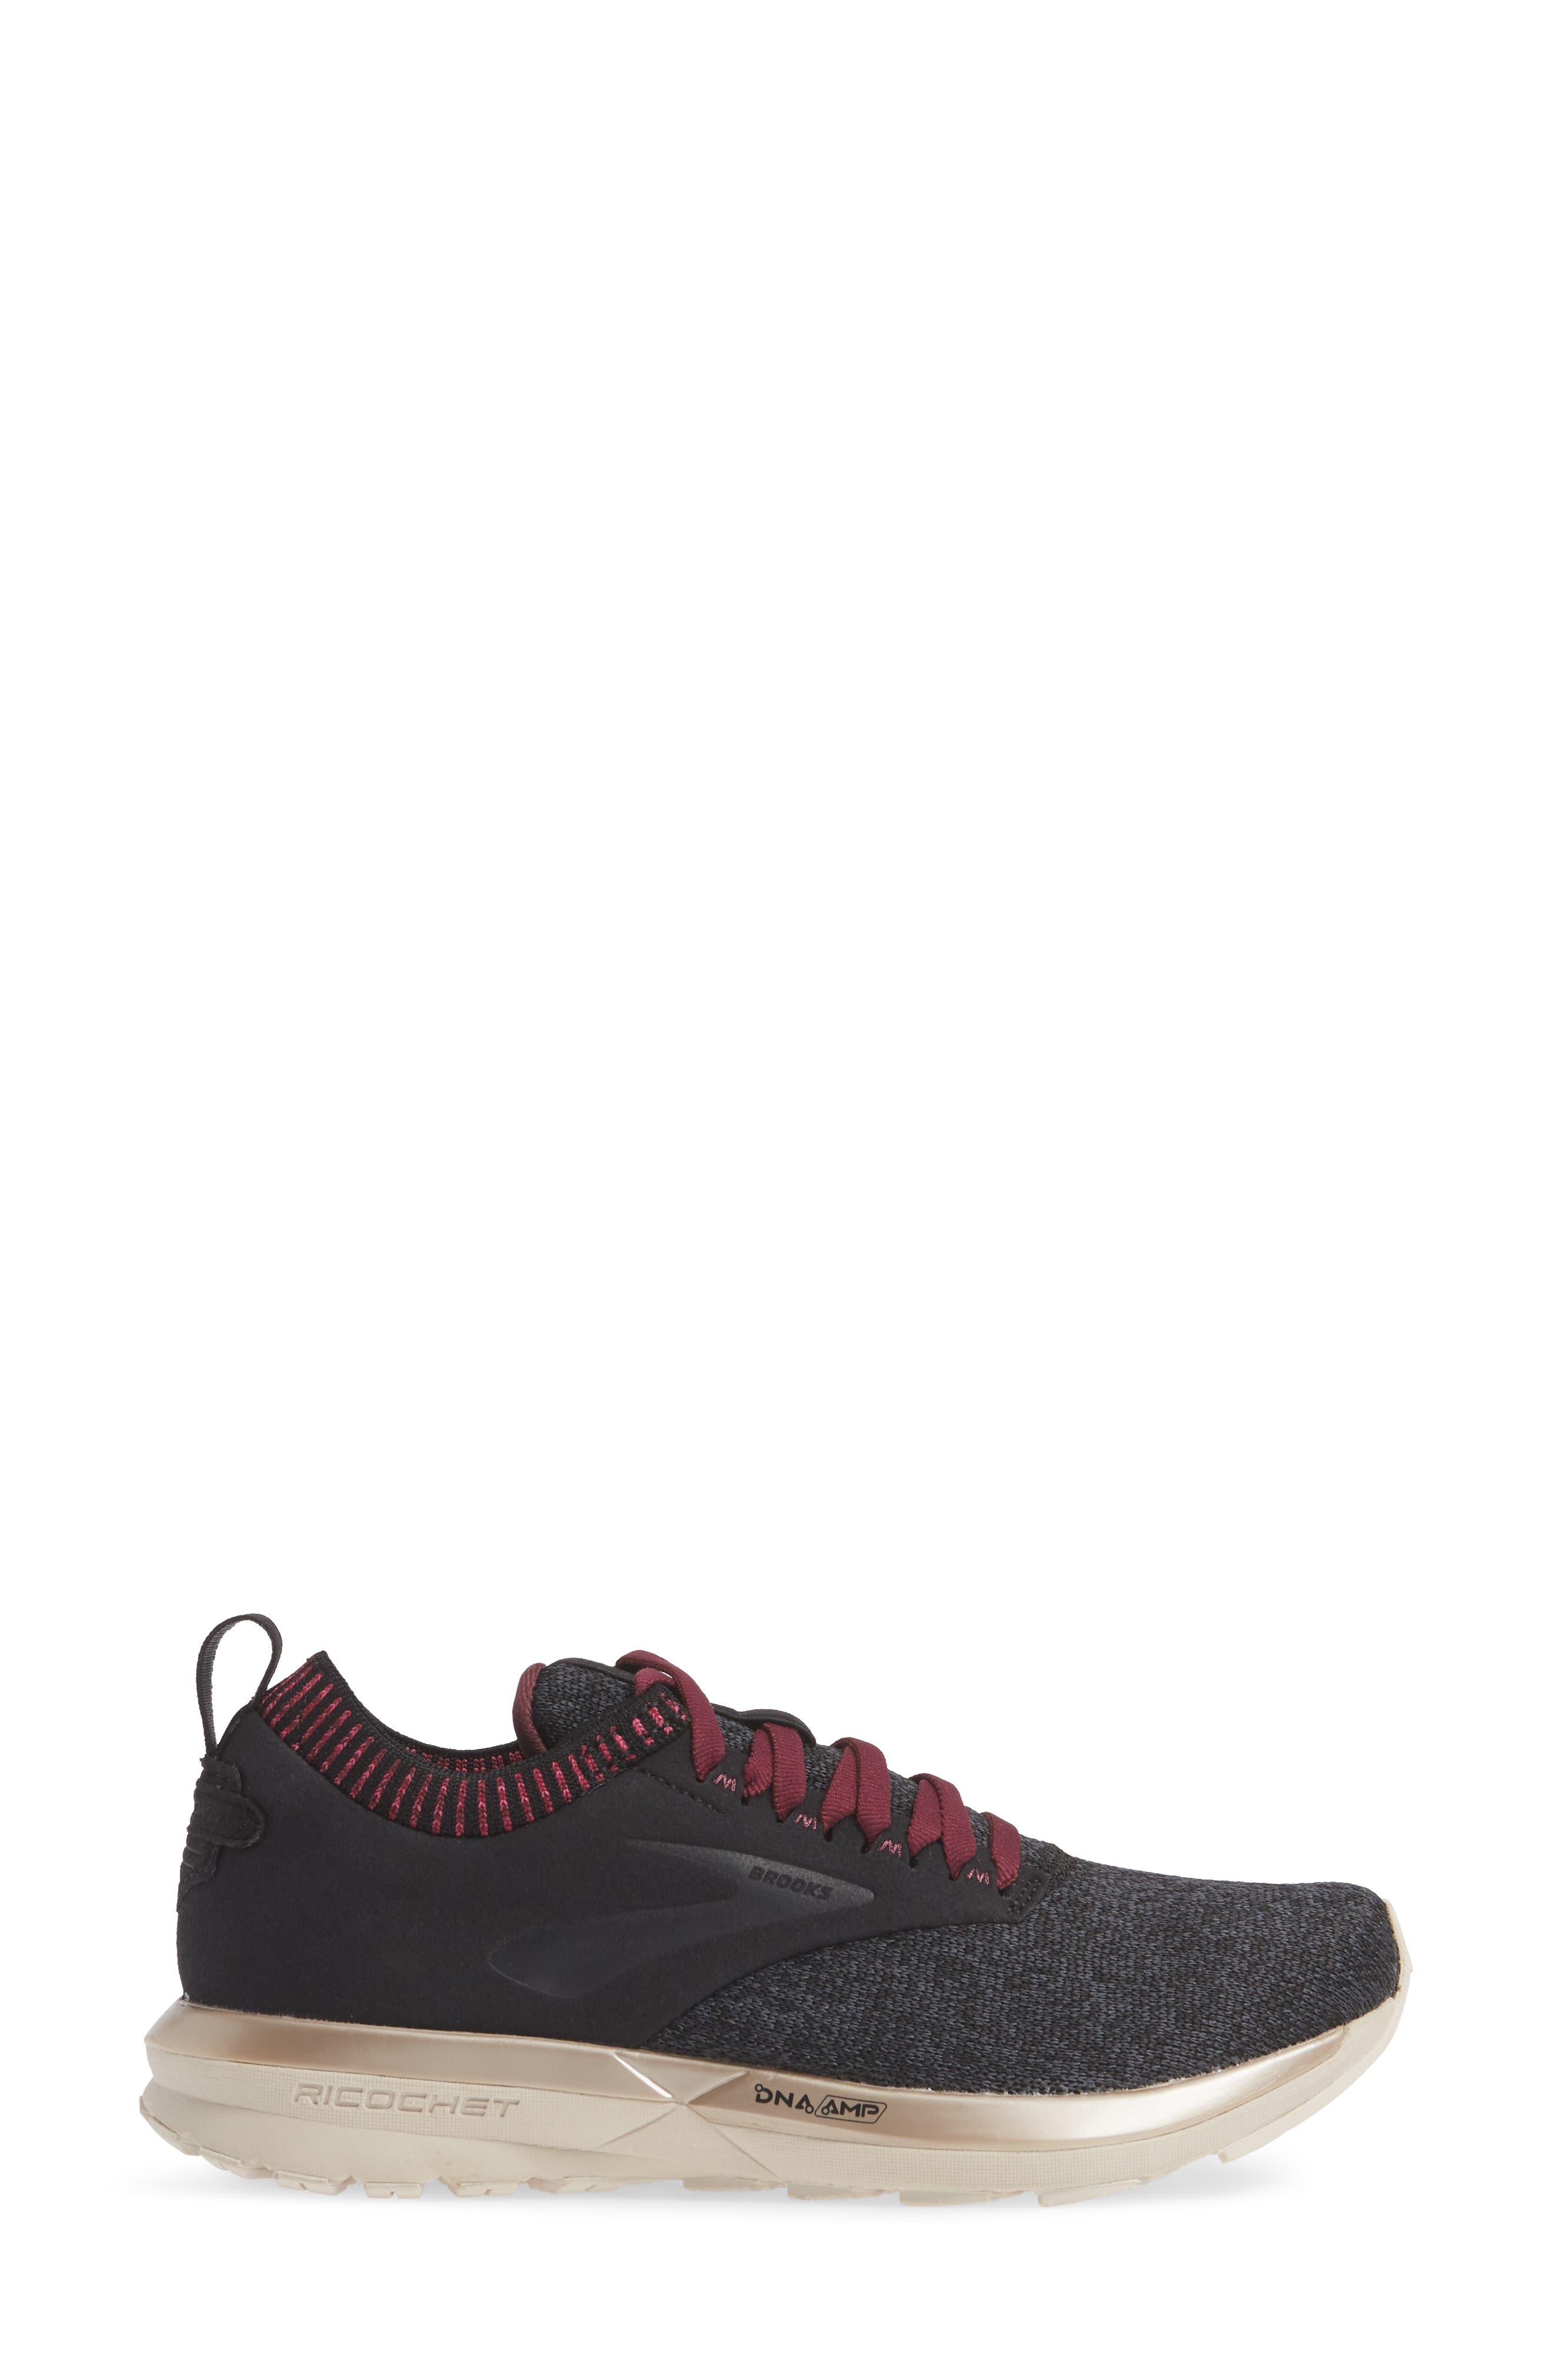 Ricochet LE Running Shoe,                             Alternate thumbnail 3, color,                             BLACK/ GREY/ PINK